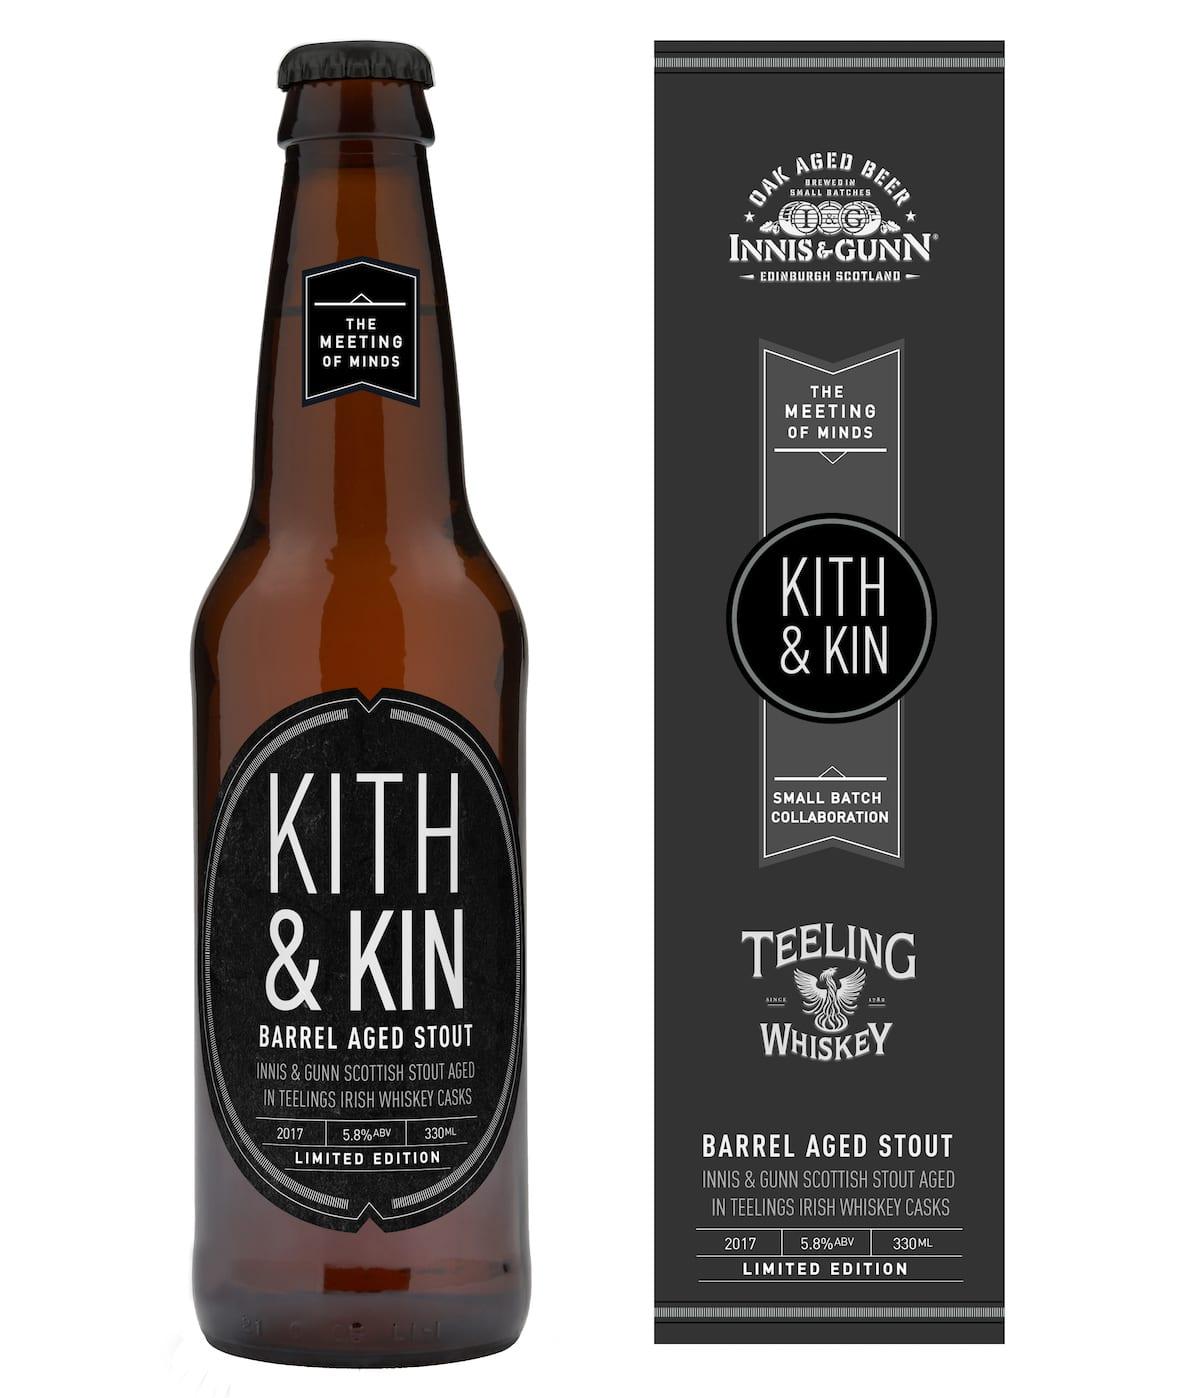 Innis & Gunn Kith & Kin Teeling Cask.